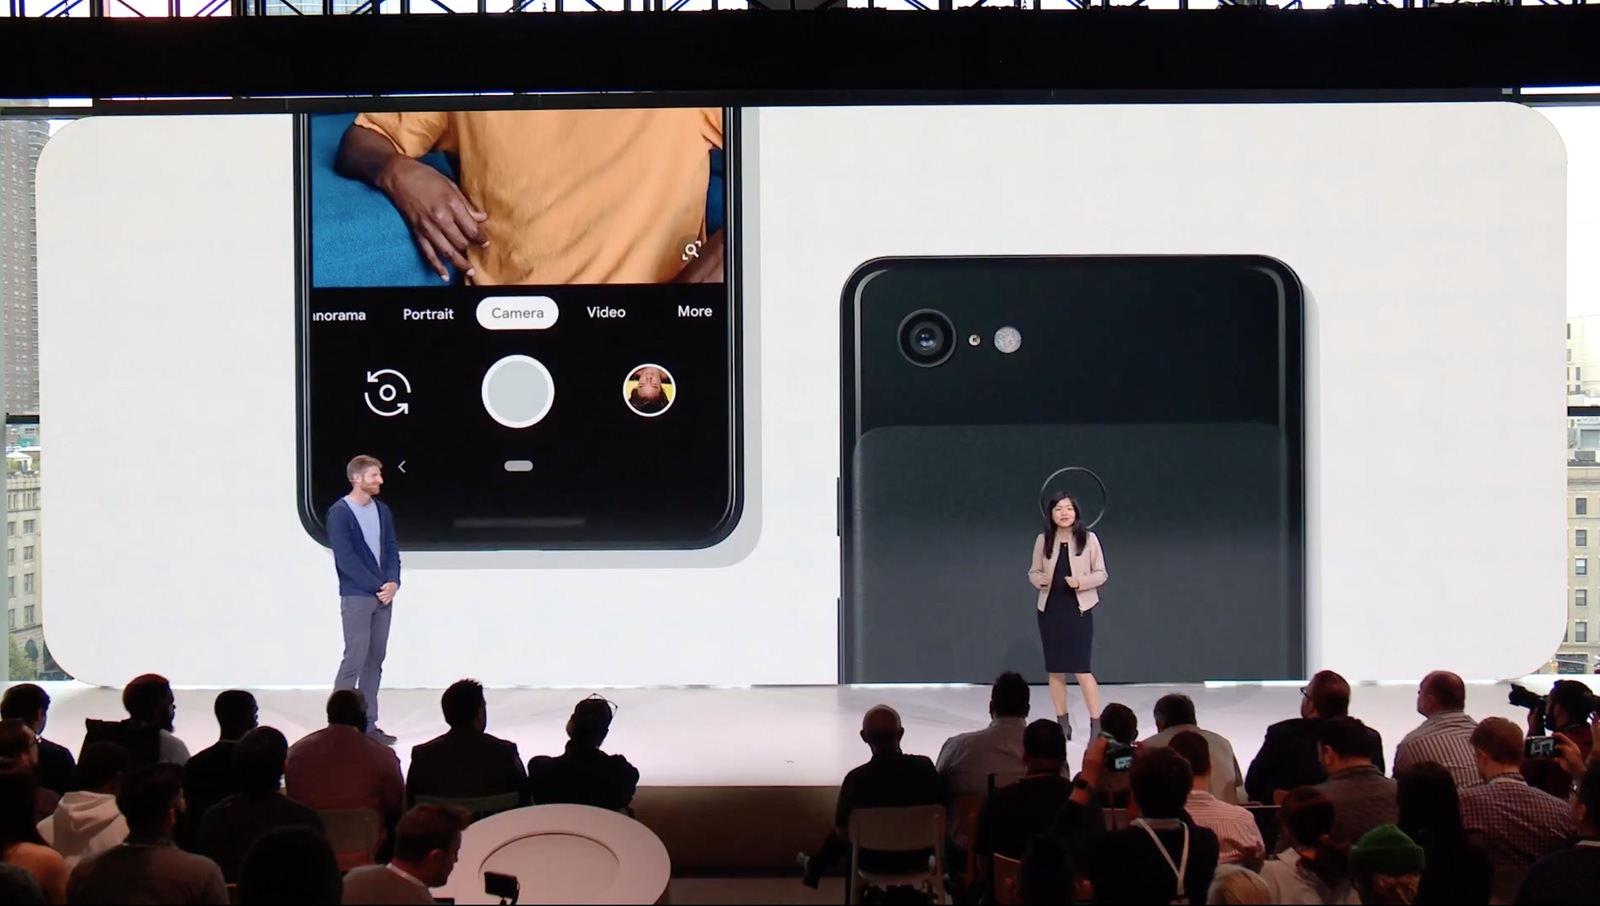 Google Pixel 3 Camera Features 10